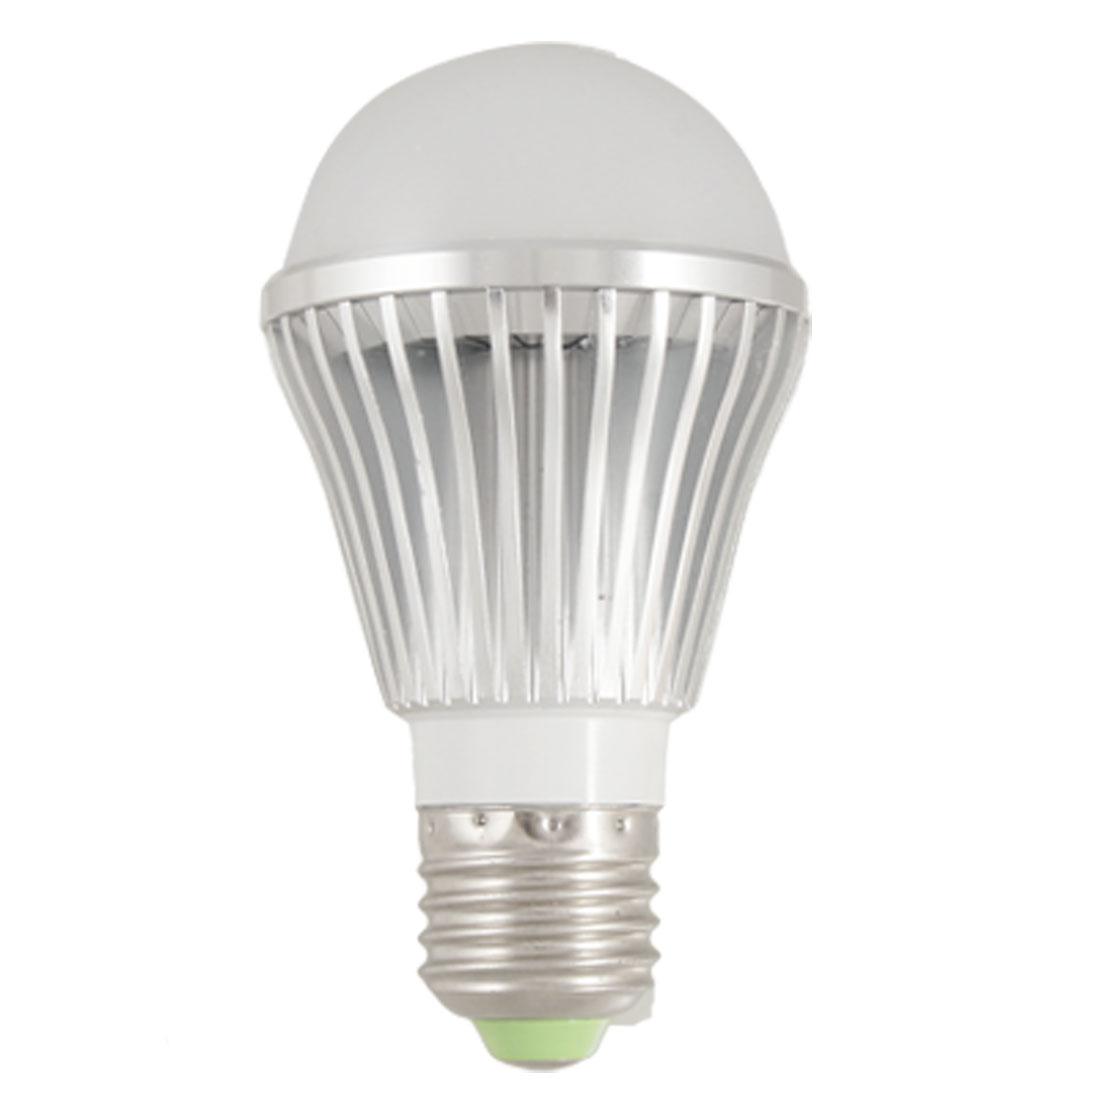 AC 100-240V E27 Base 5W White LED Globe Bulb Lamp 6000-6500K